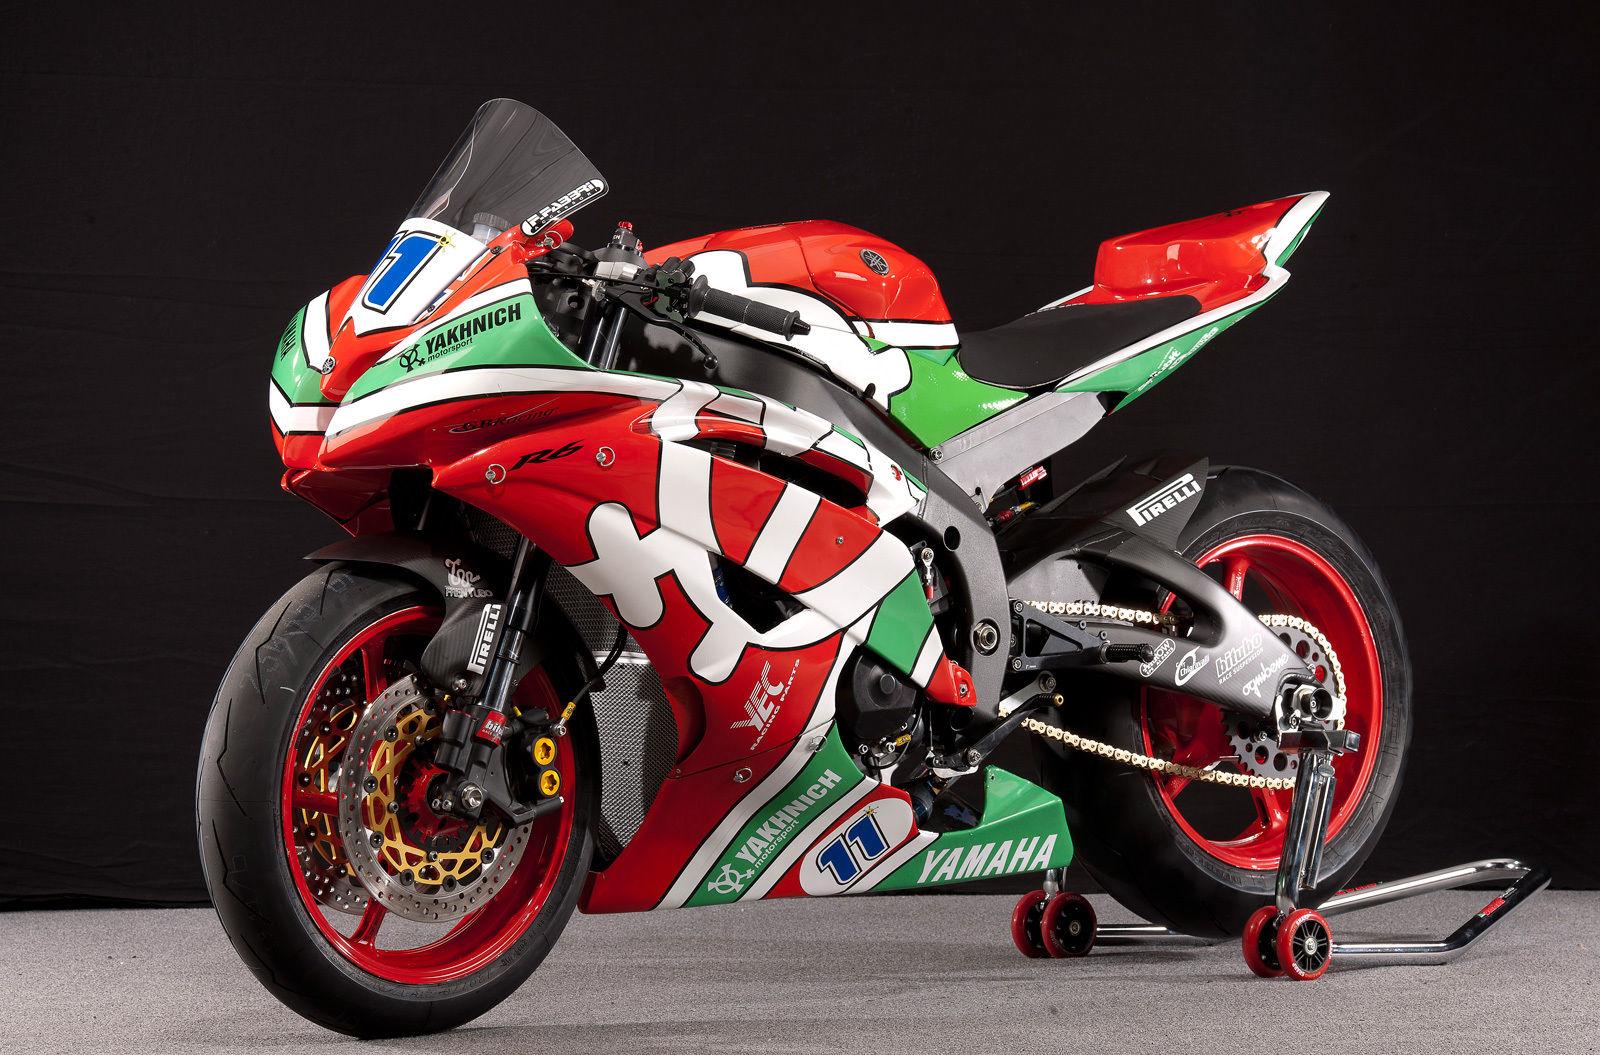 Supersport World Champion 2013 Yamaha R6 Bike Urious